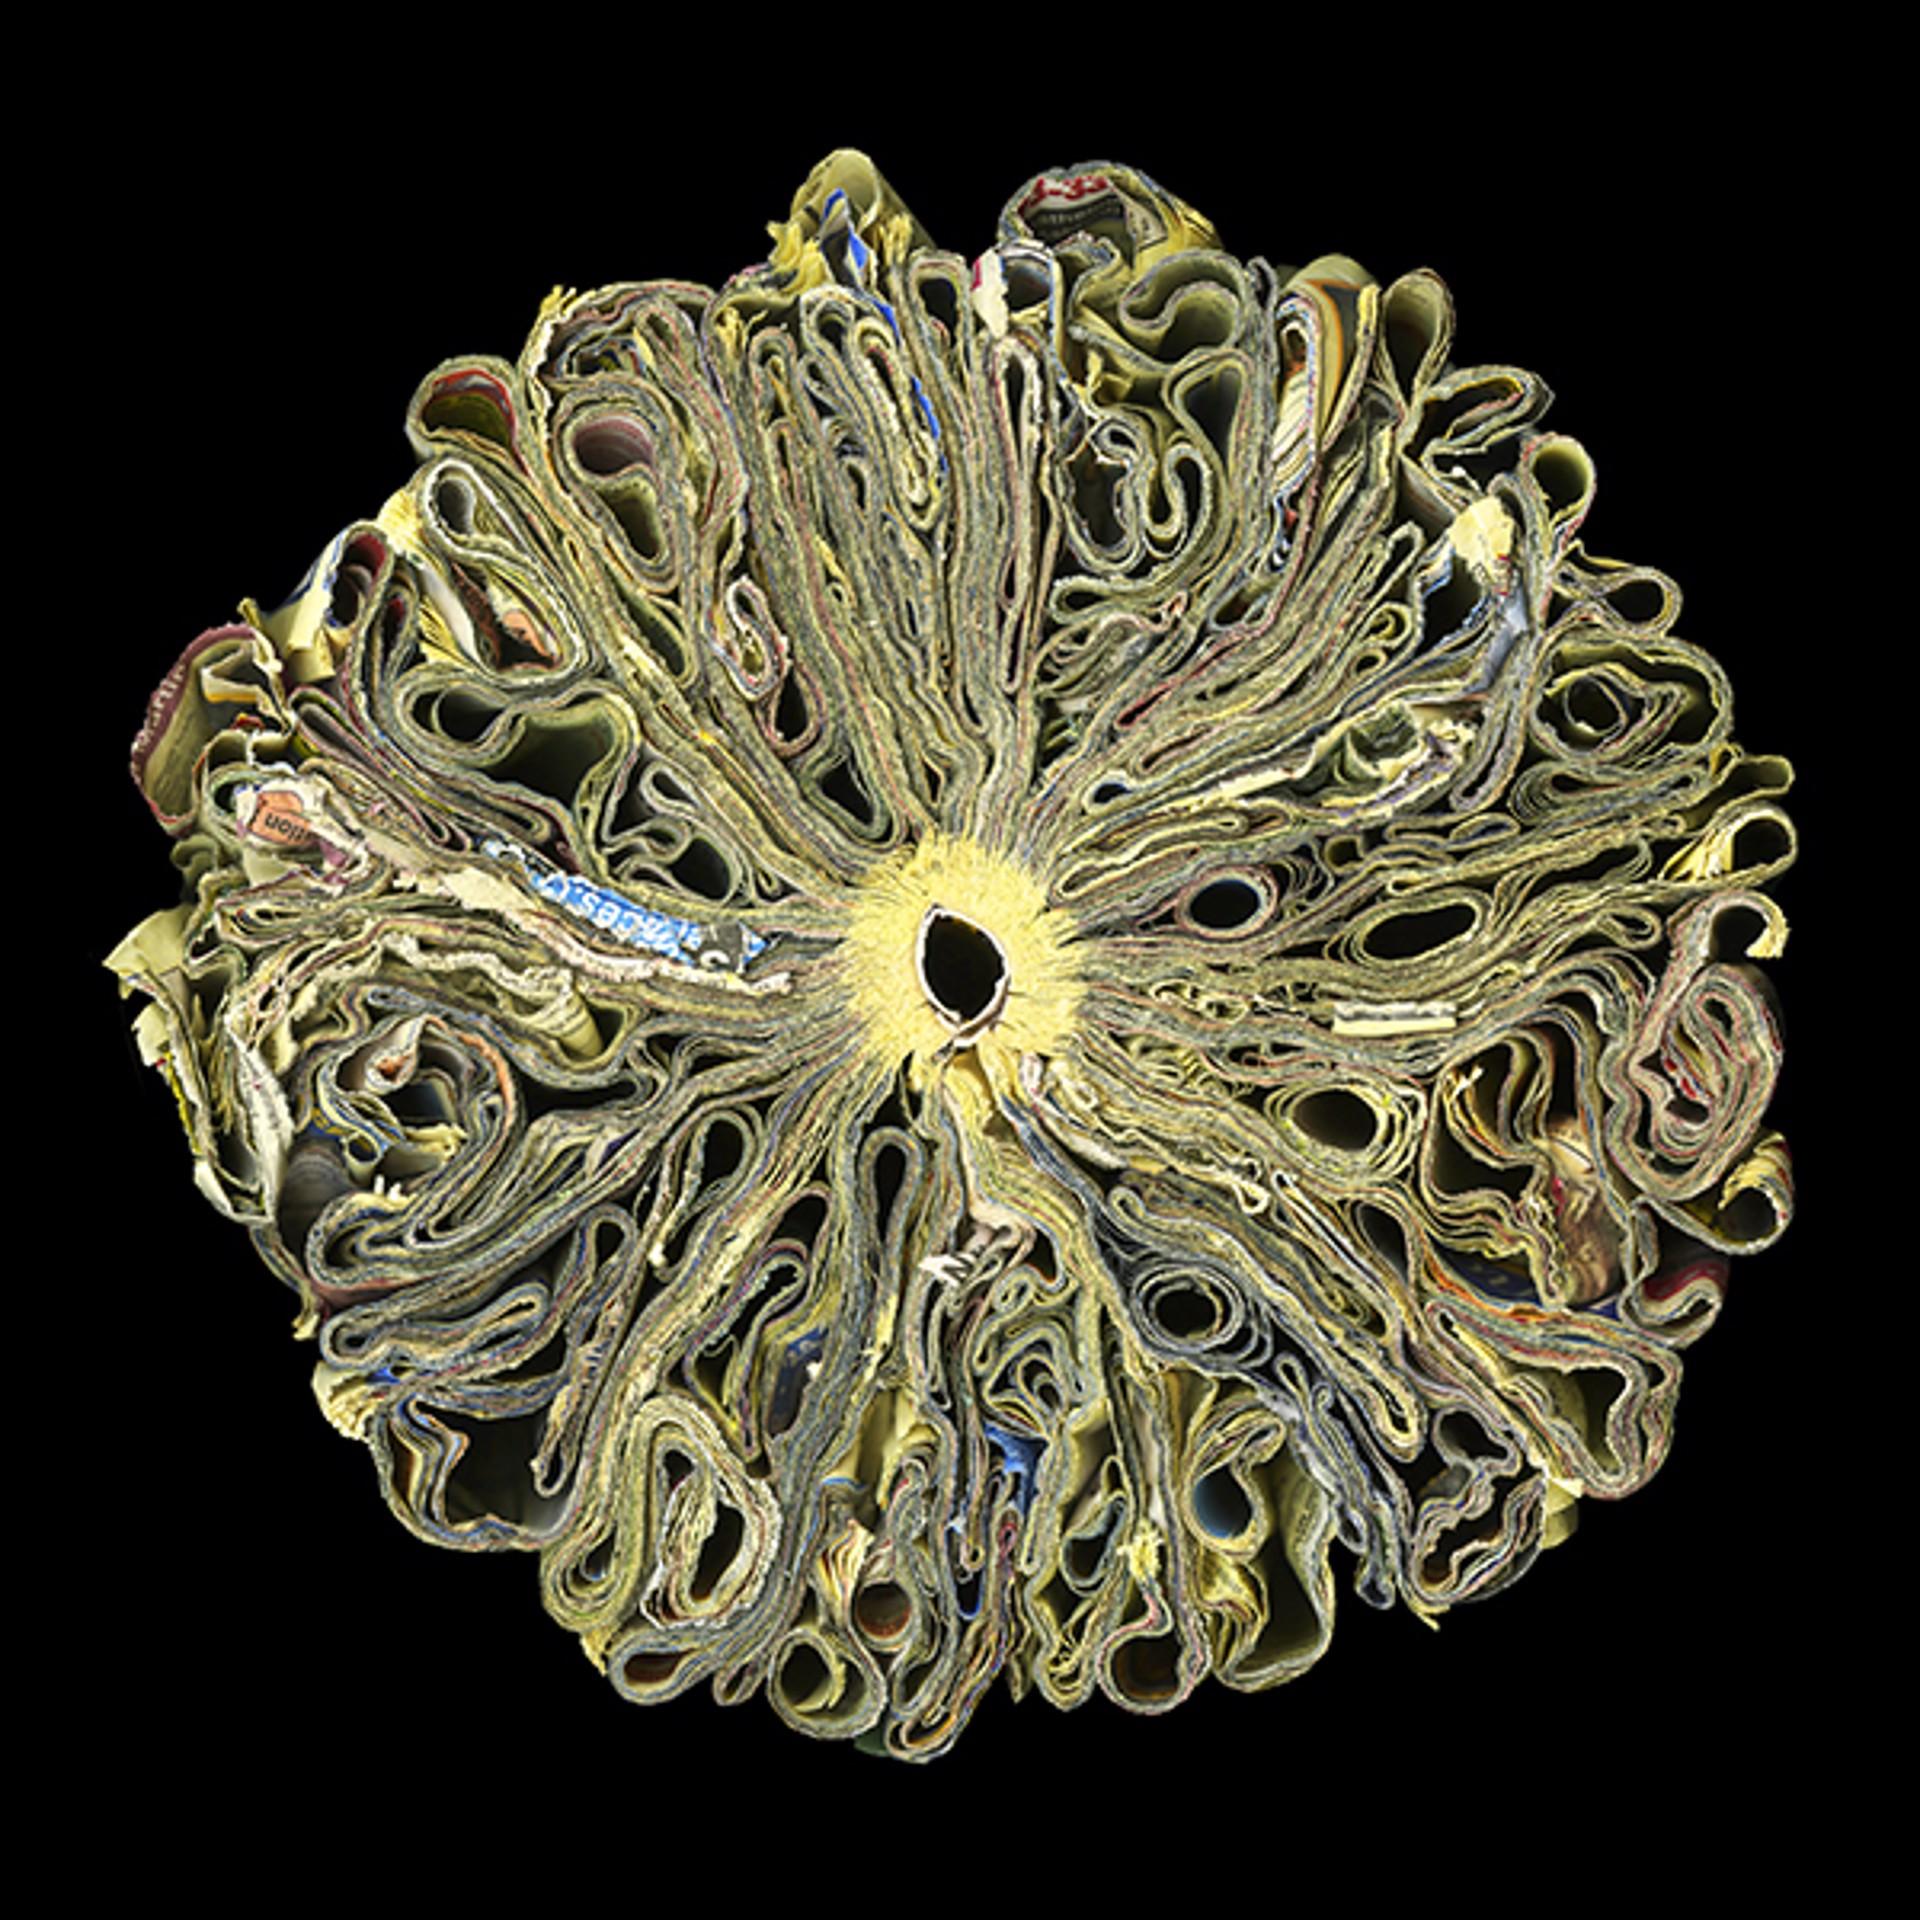 Sunflower by Cara Barer